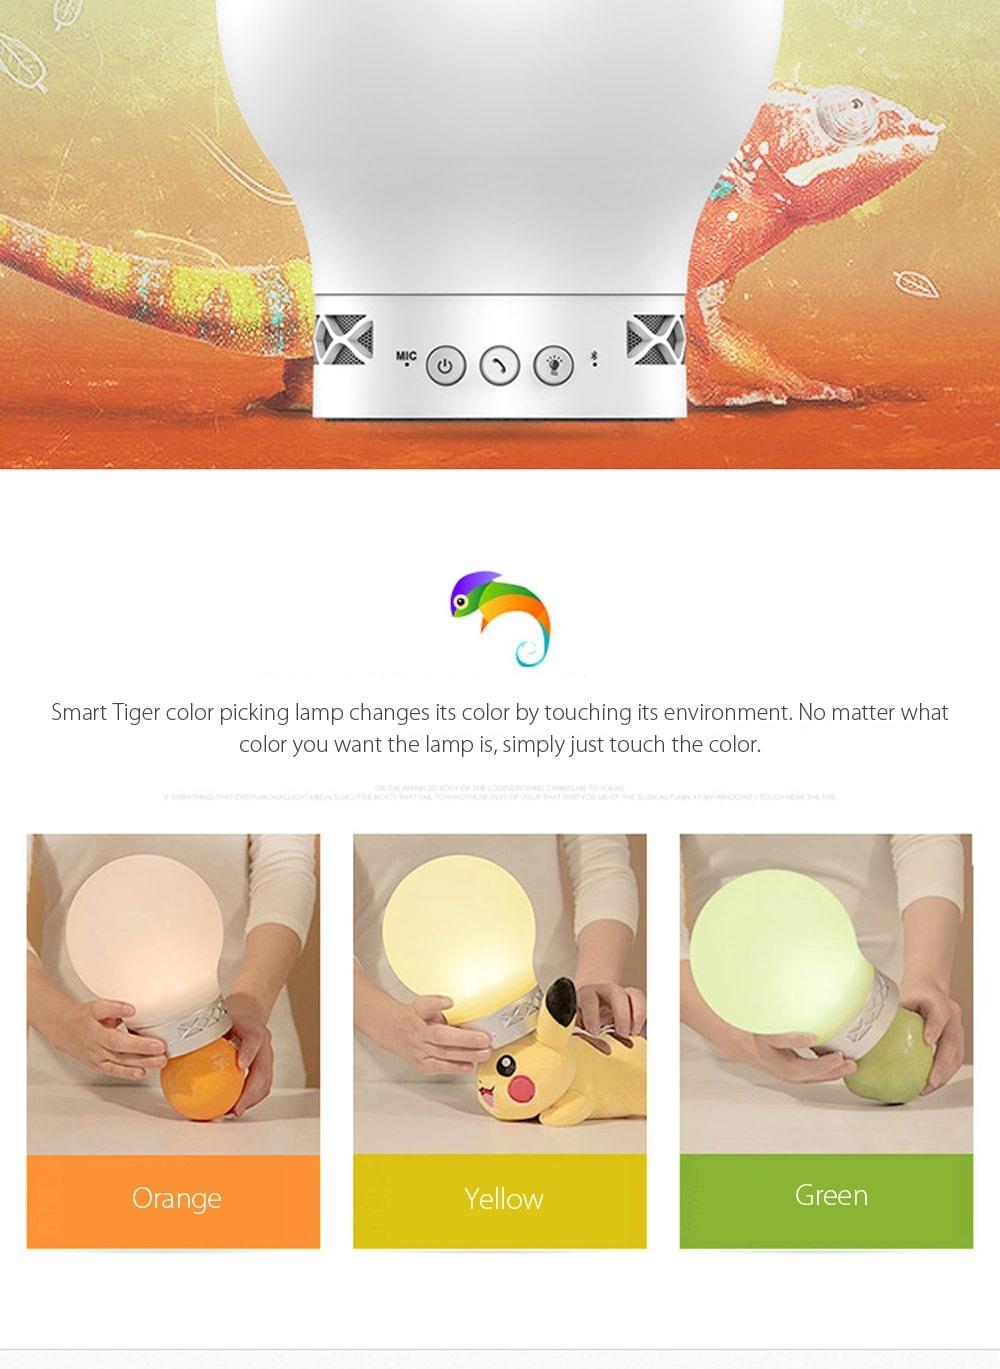 Smart Tiger Color Picking Music Lamp Apollobox